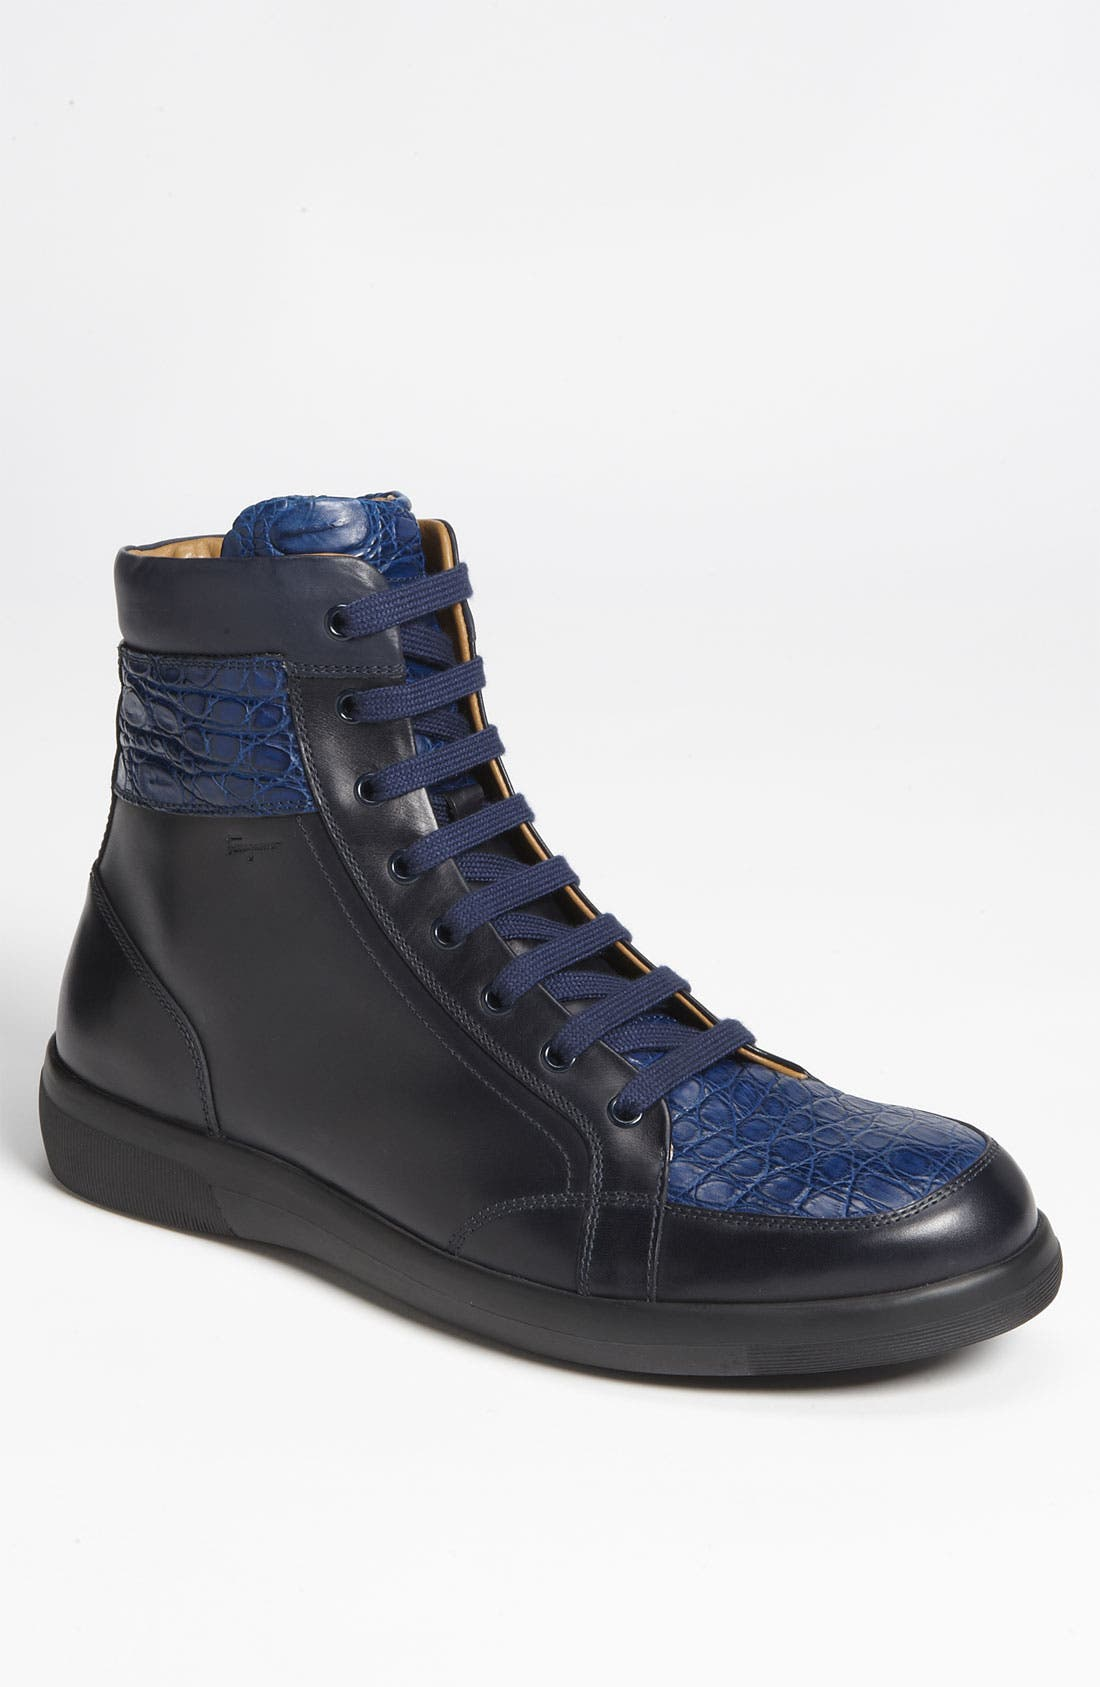 Alternate Image 1 Selected - Salvatore Ferragamo 'Austria 2' Hi-Top Sneaker